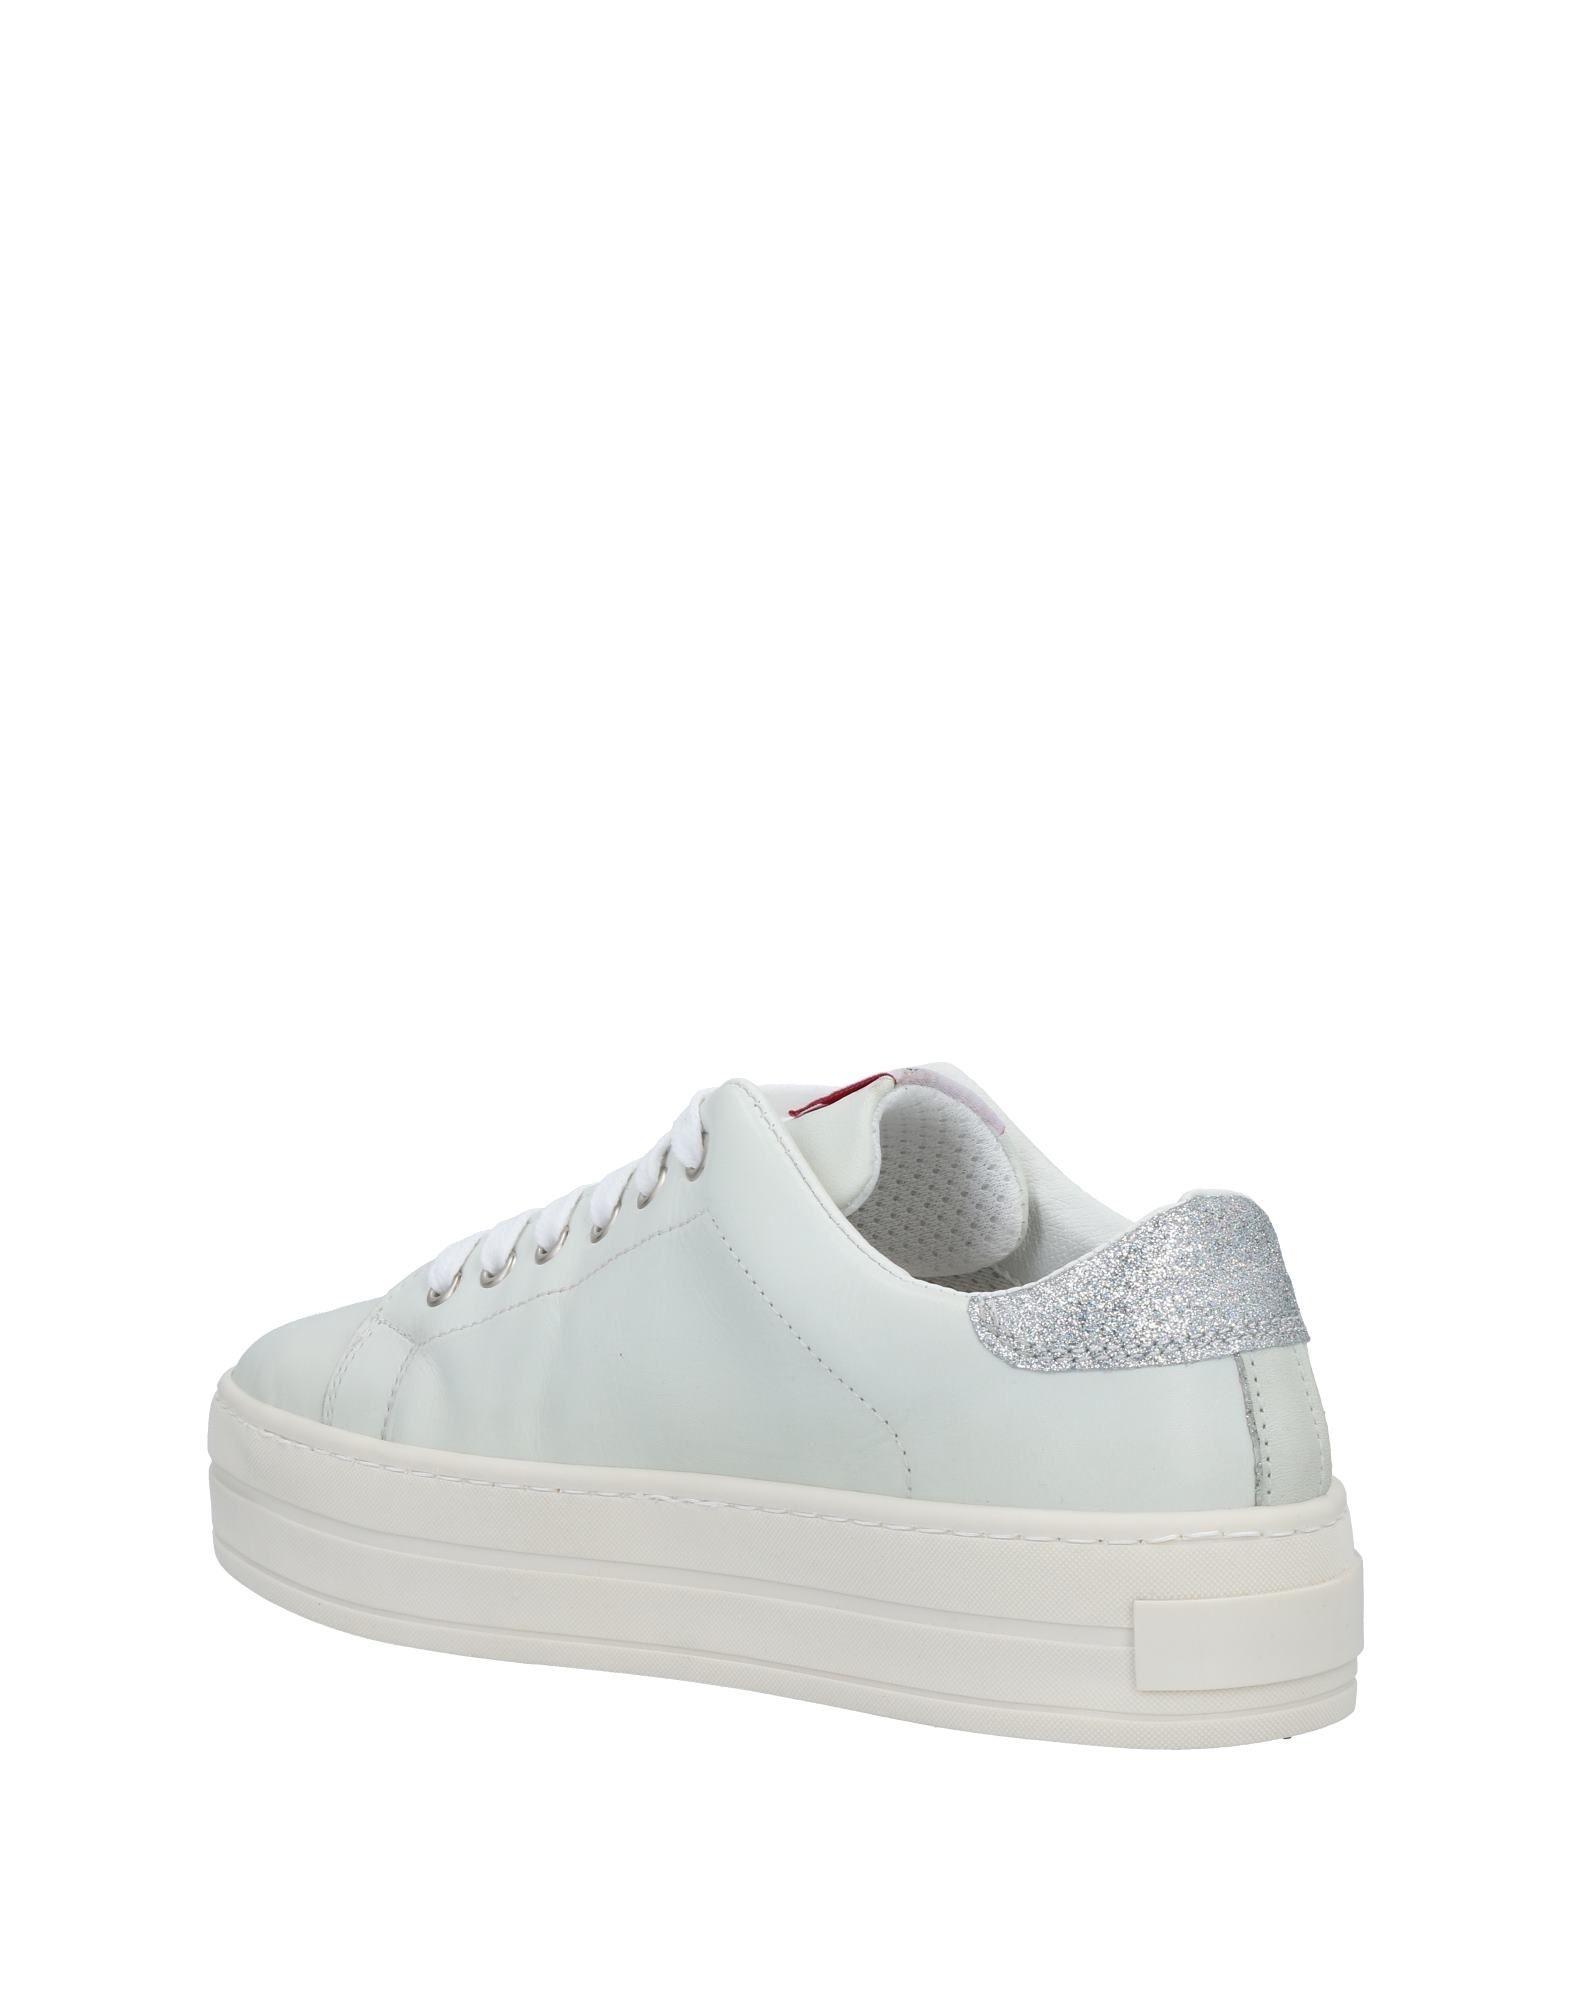 Fornarina Sneakers Damen  11494212NM Schuhe Gute Qualität beliebte Schuhe 11494212NM 386a9f